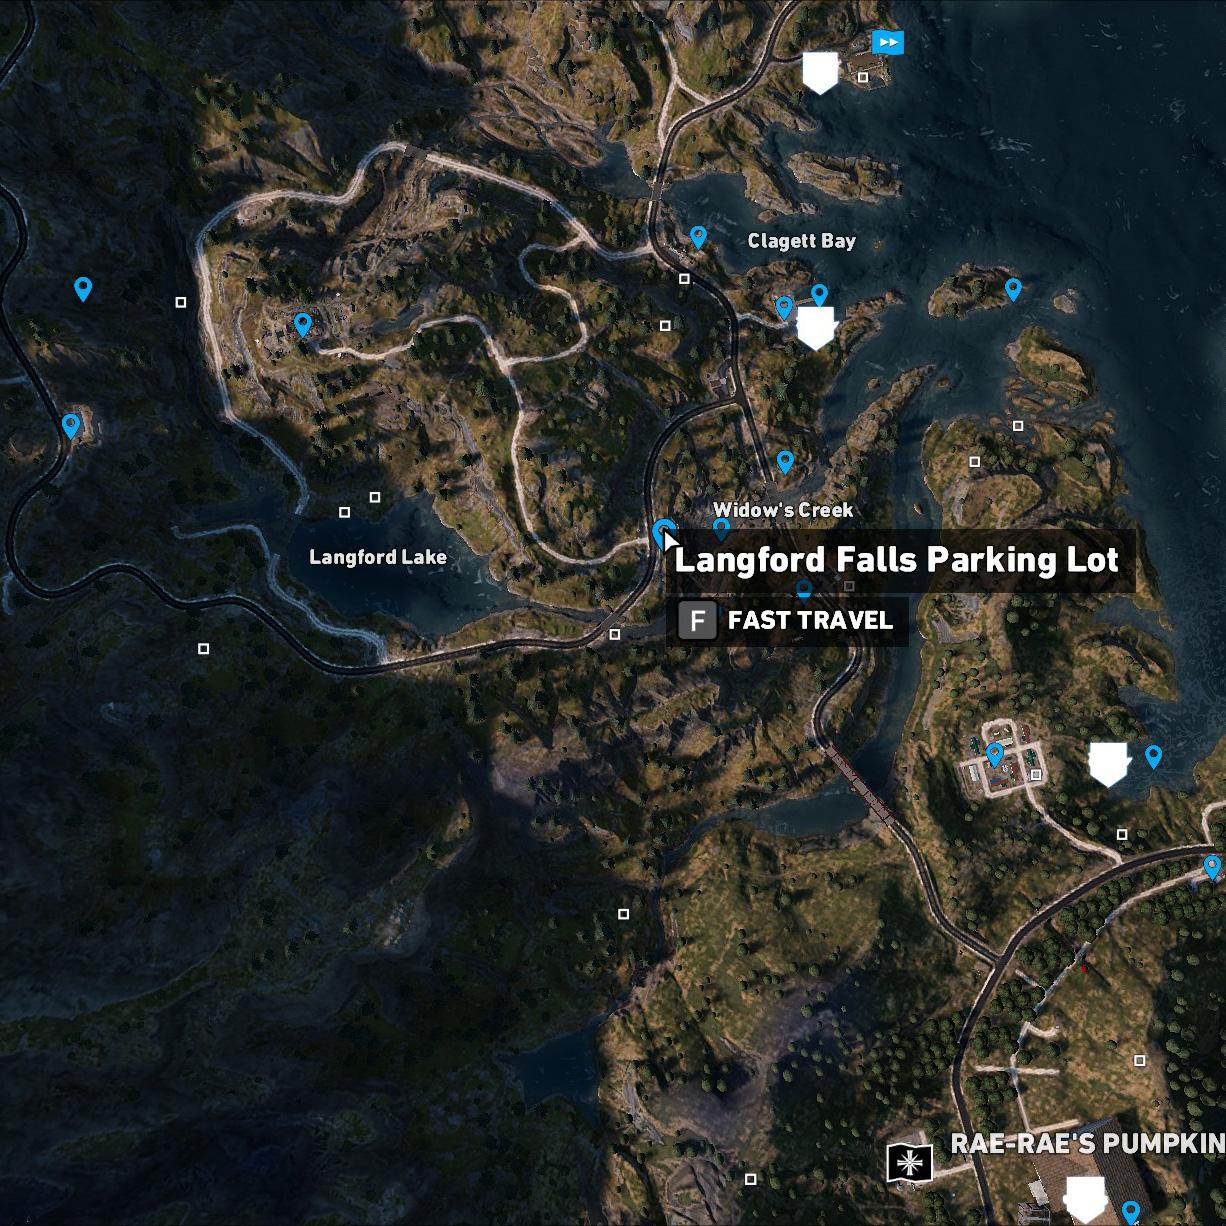 Langford Falls Parking Lot